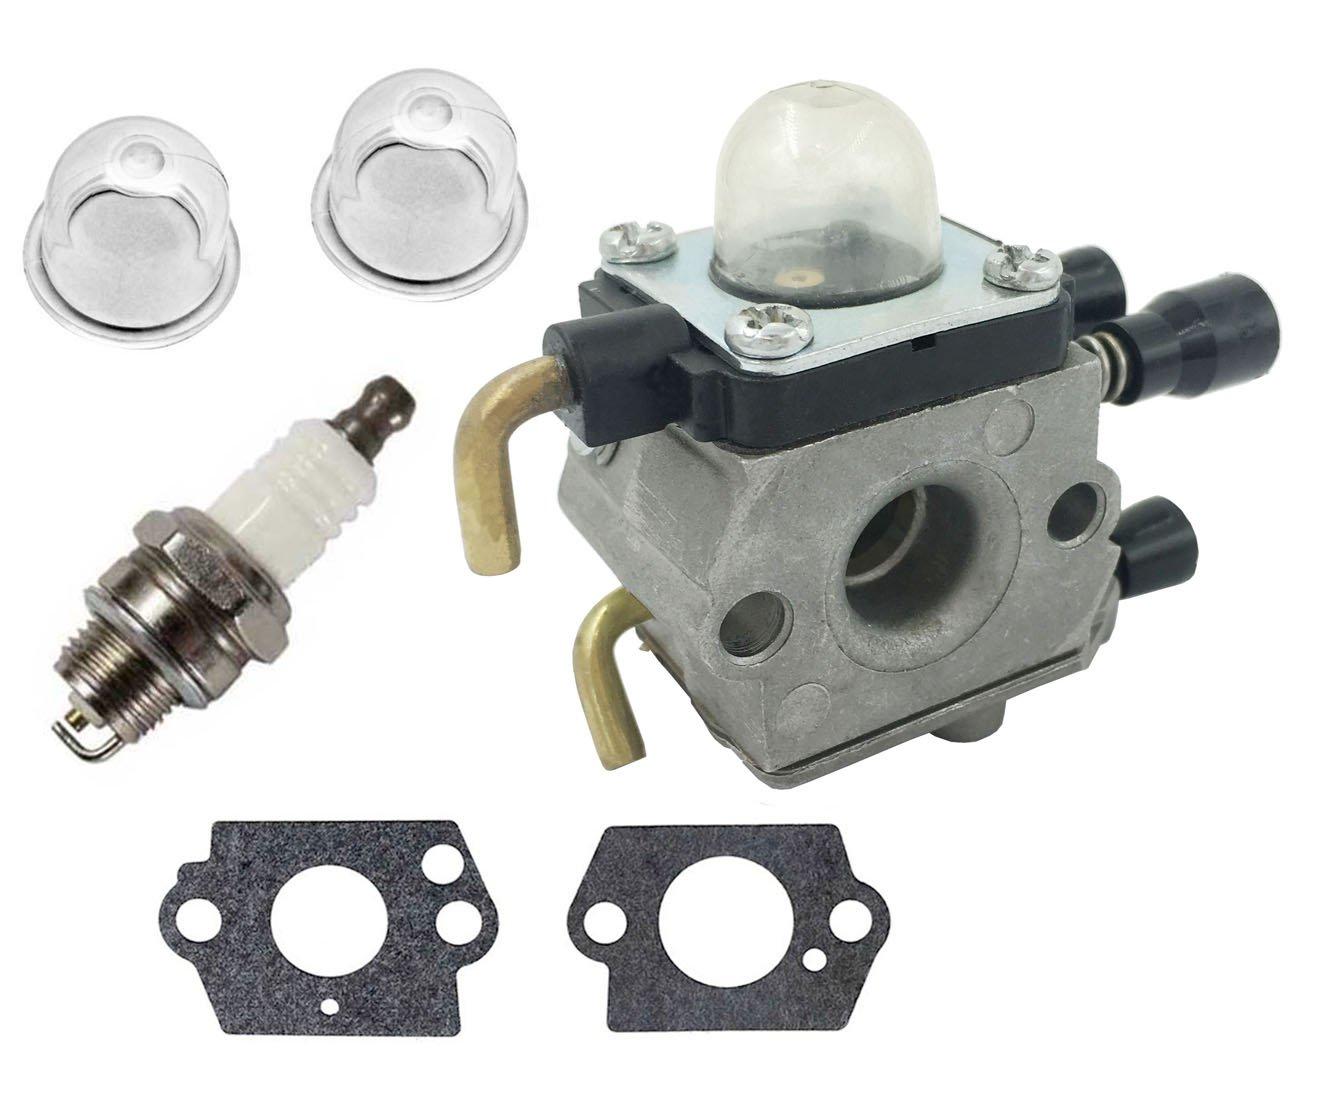 Get Quotations · Carburetor for Stihl FS80 Carburetor - STIHL FC55 FC75  FC85 FS310 FS38 FS45 FS45C FS45L FS46